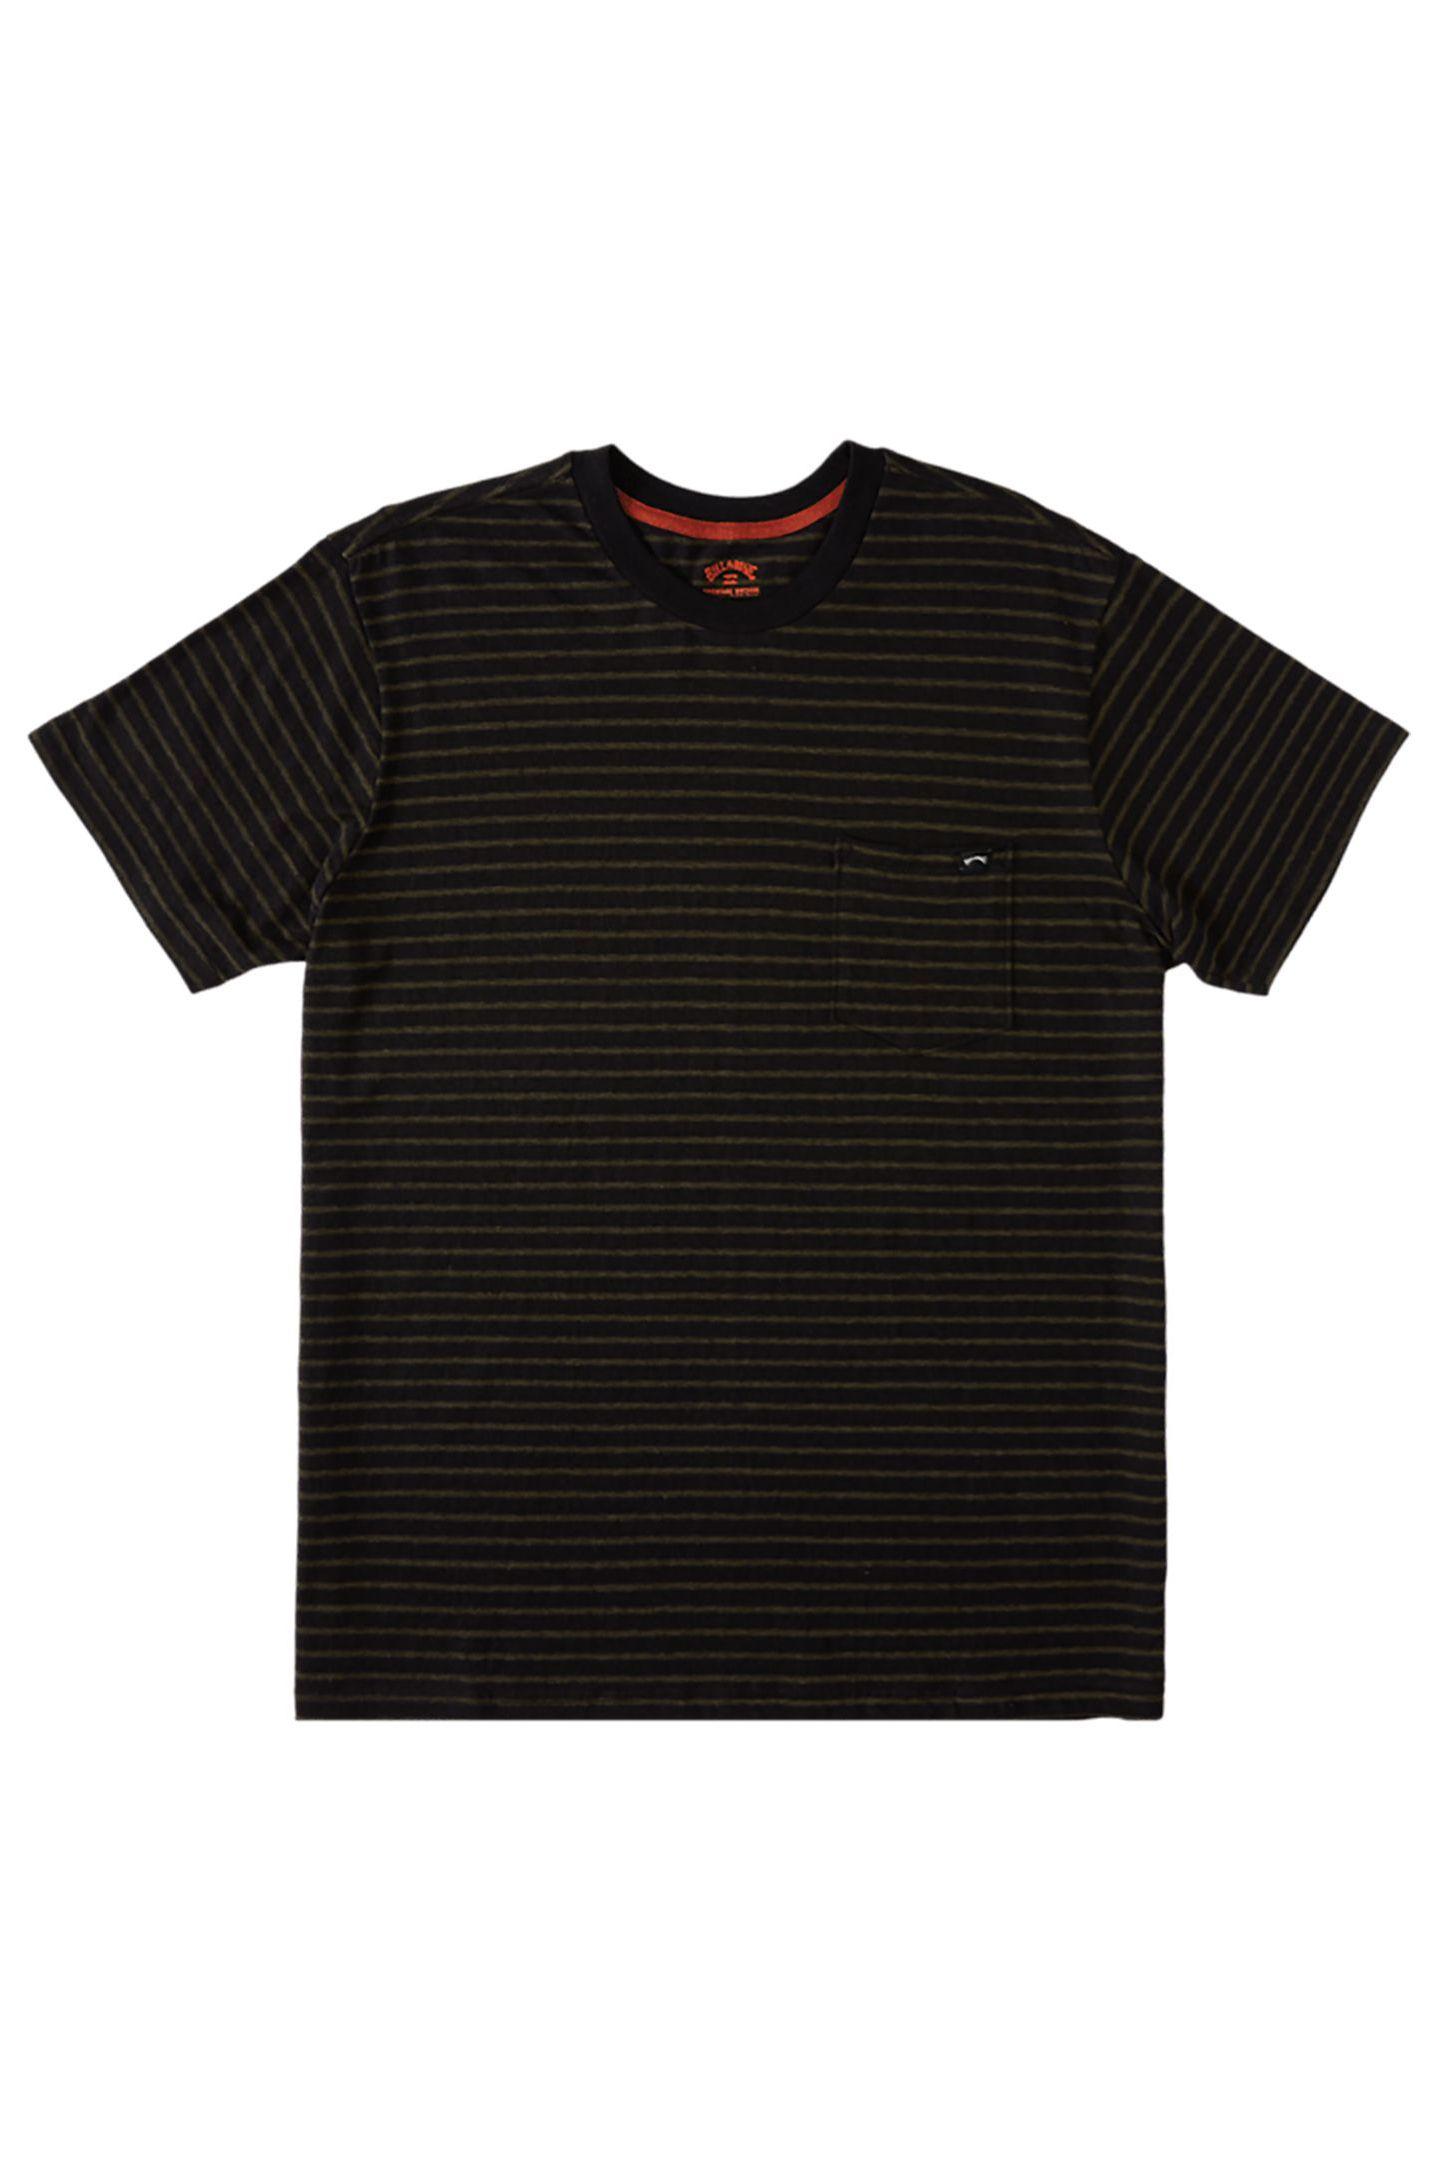 Billabong T-Shirt ELDORADO HEMP STRIPE ADVENTURE DIVISION Black